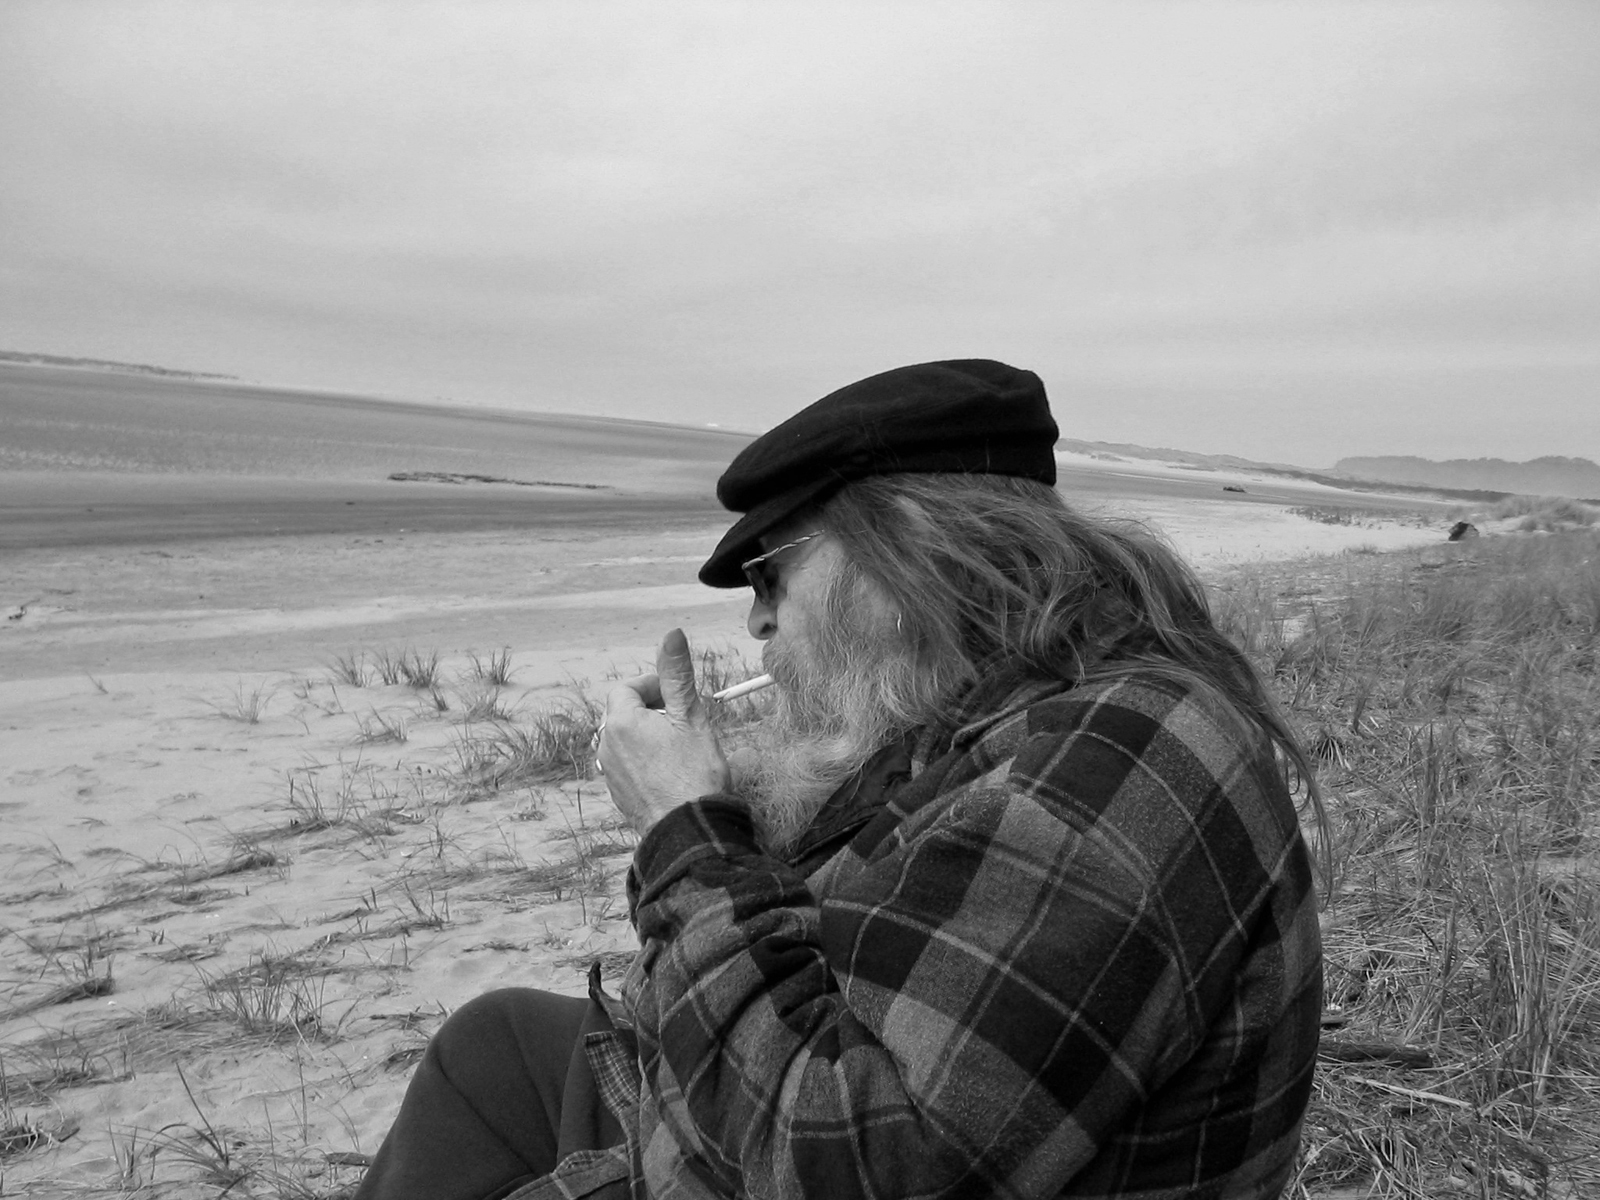 Old man & the sea photo